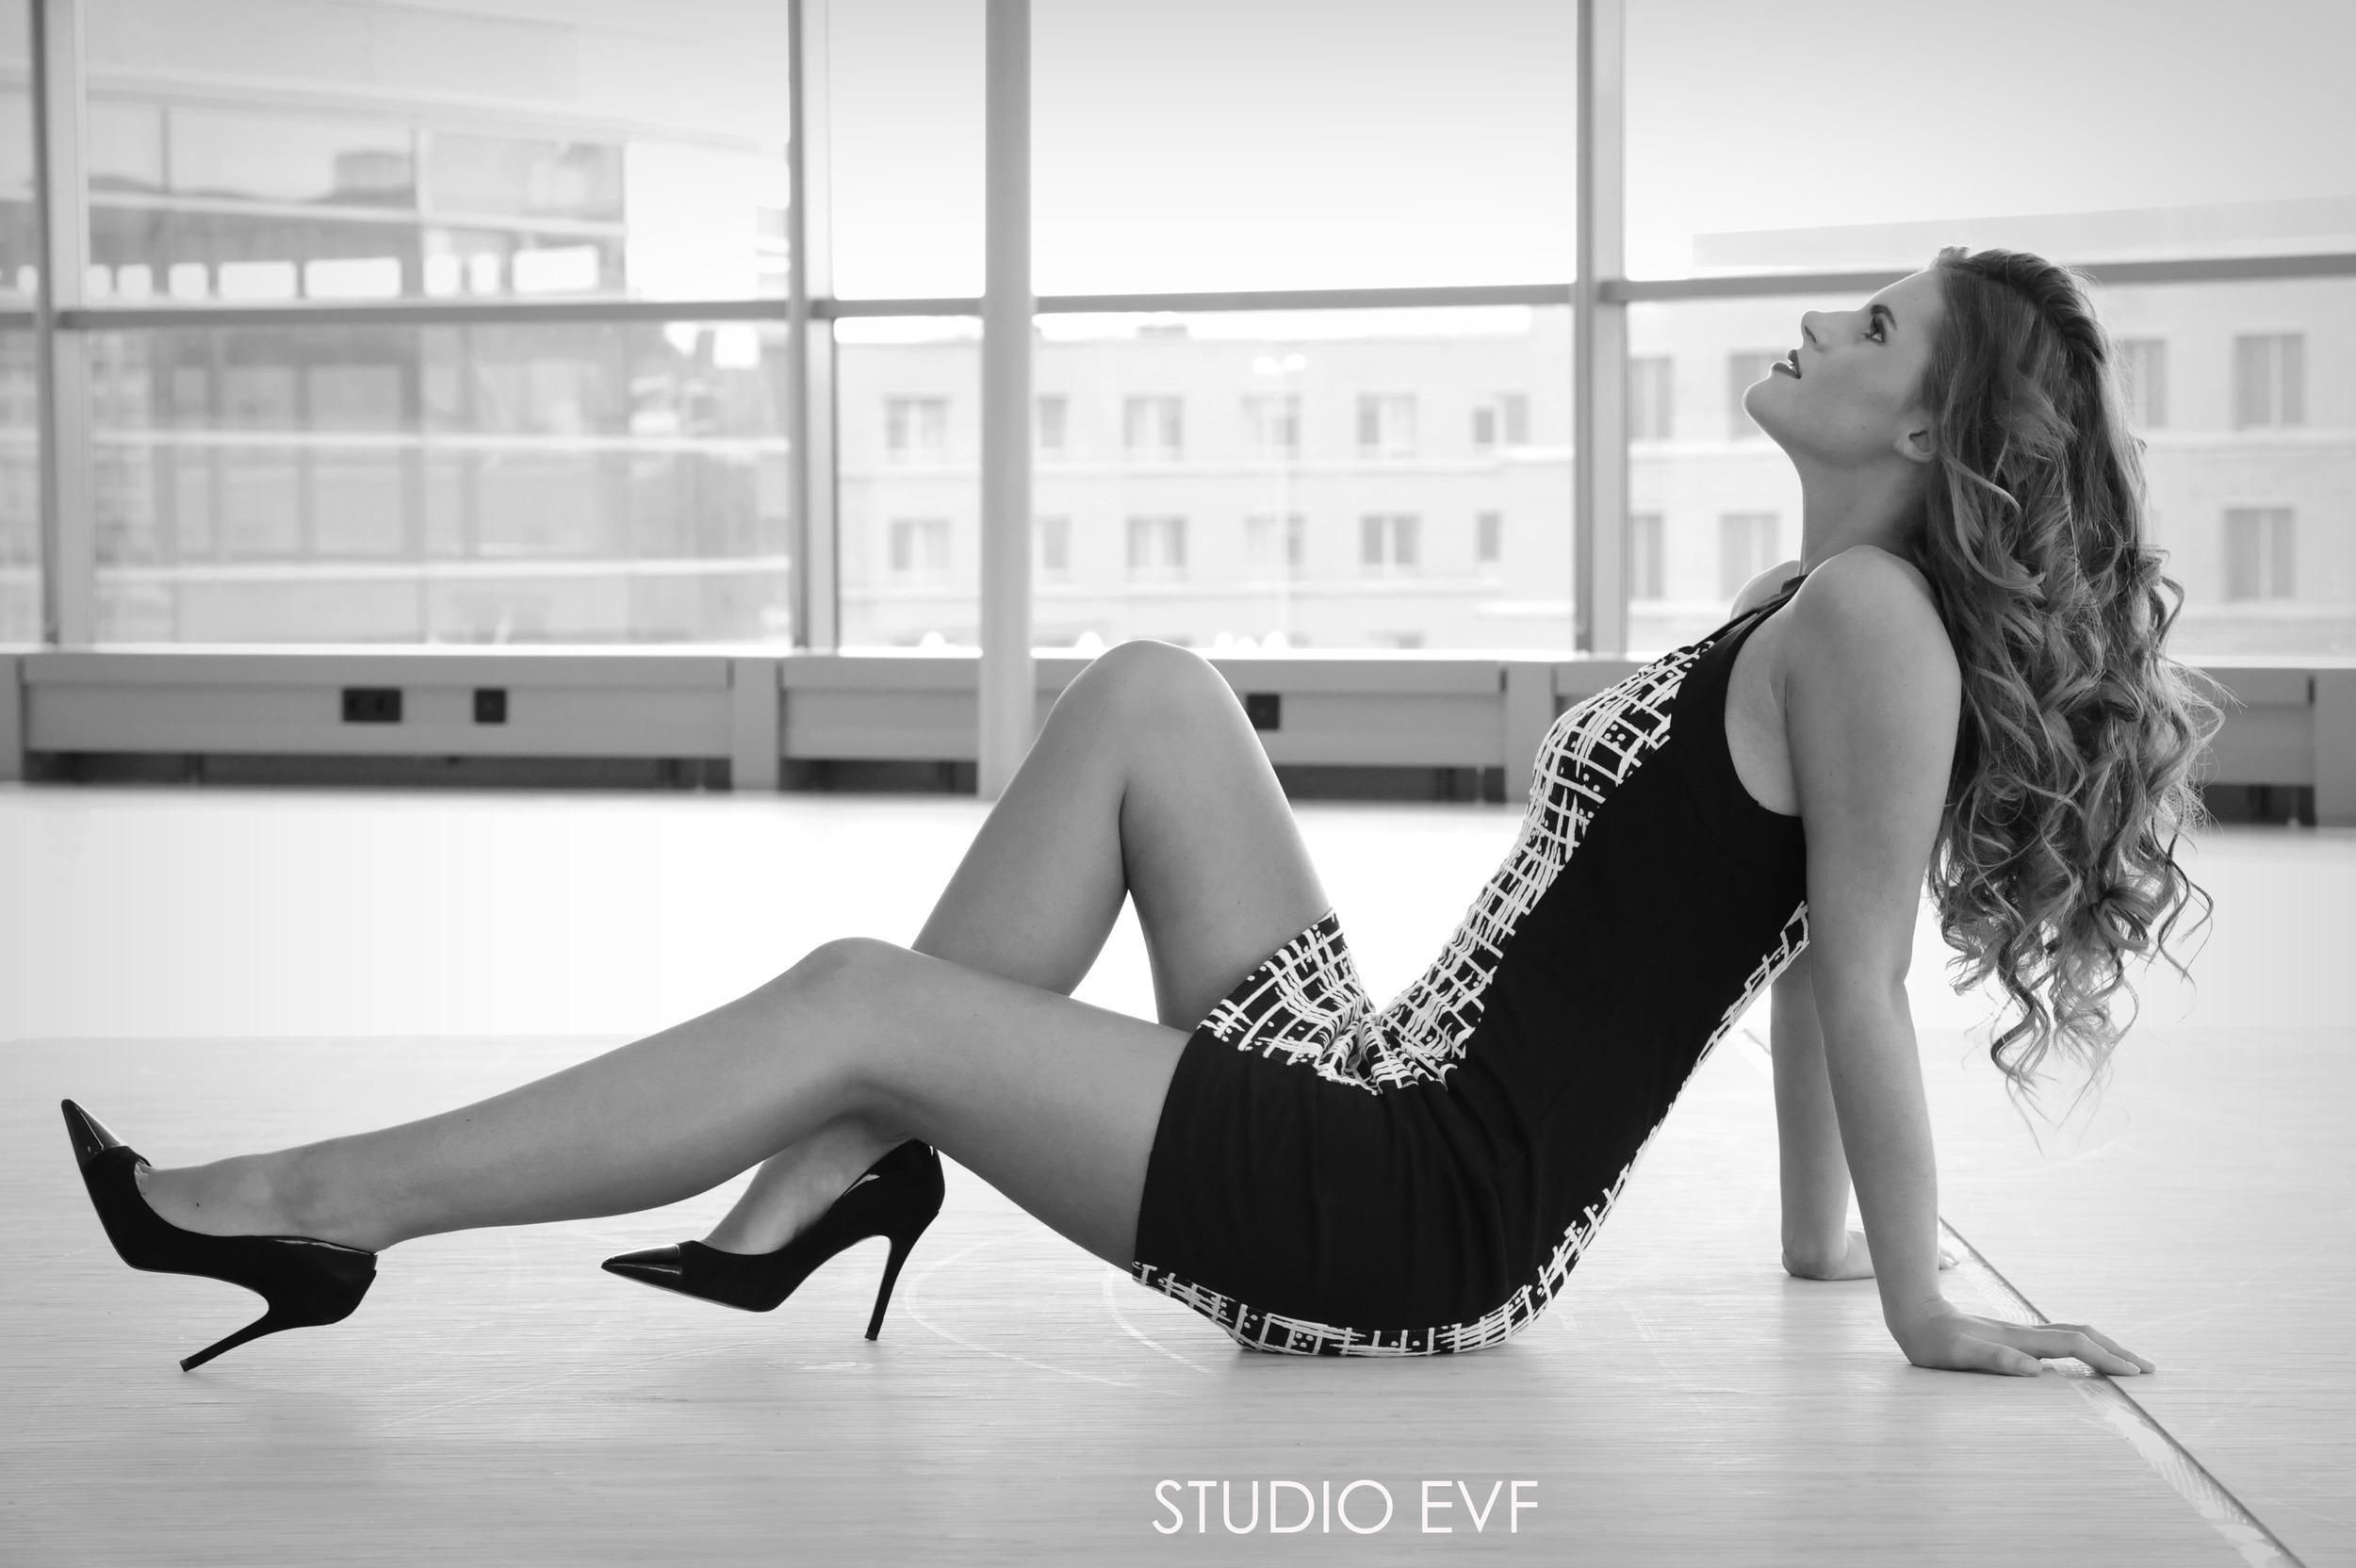 Studio EVF Fotografie Els verbakel